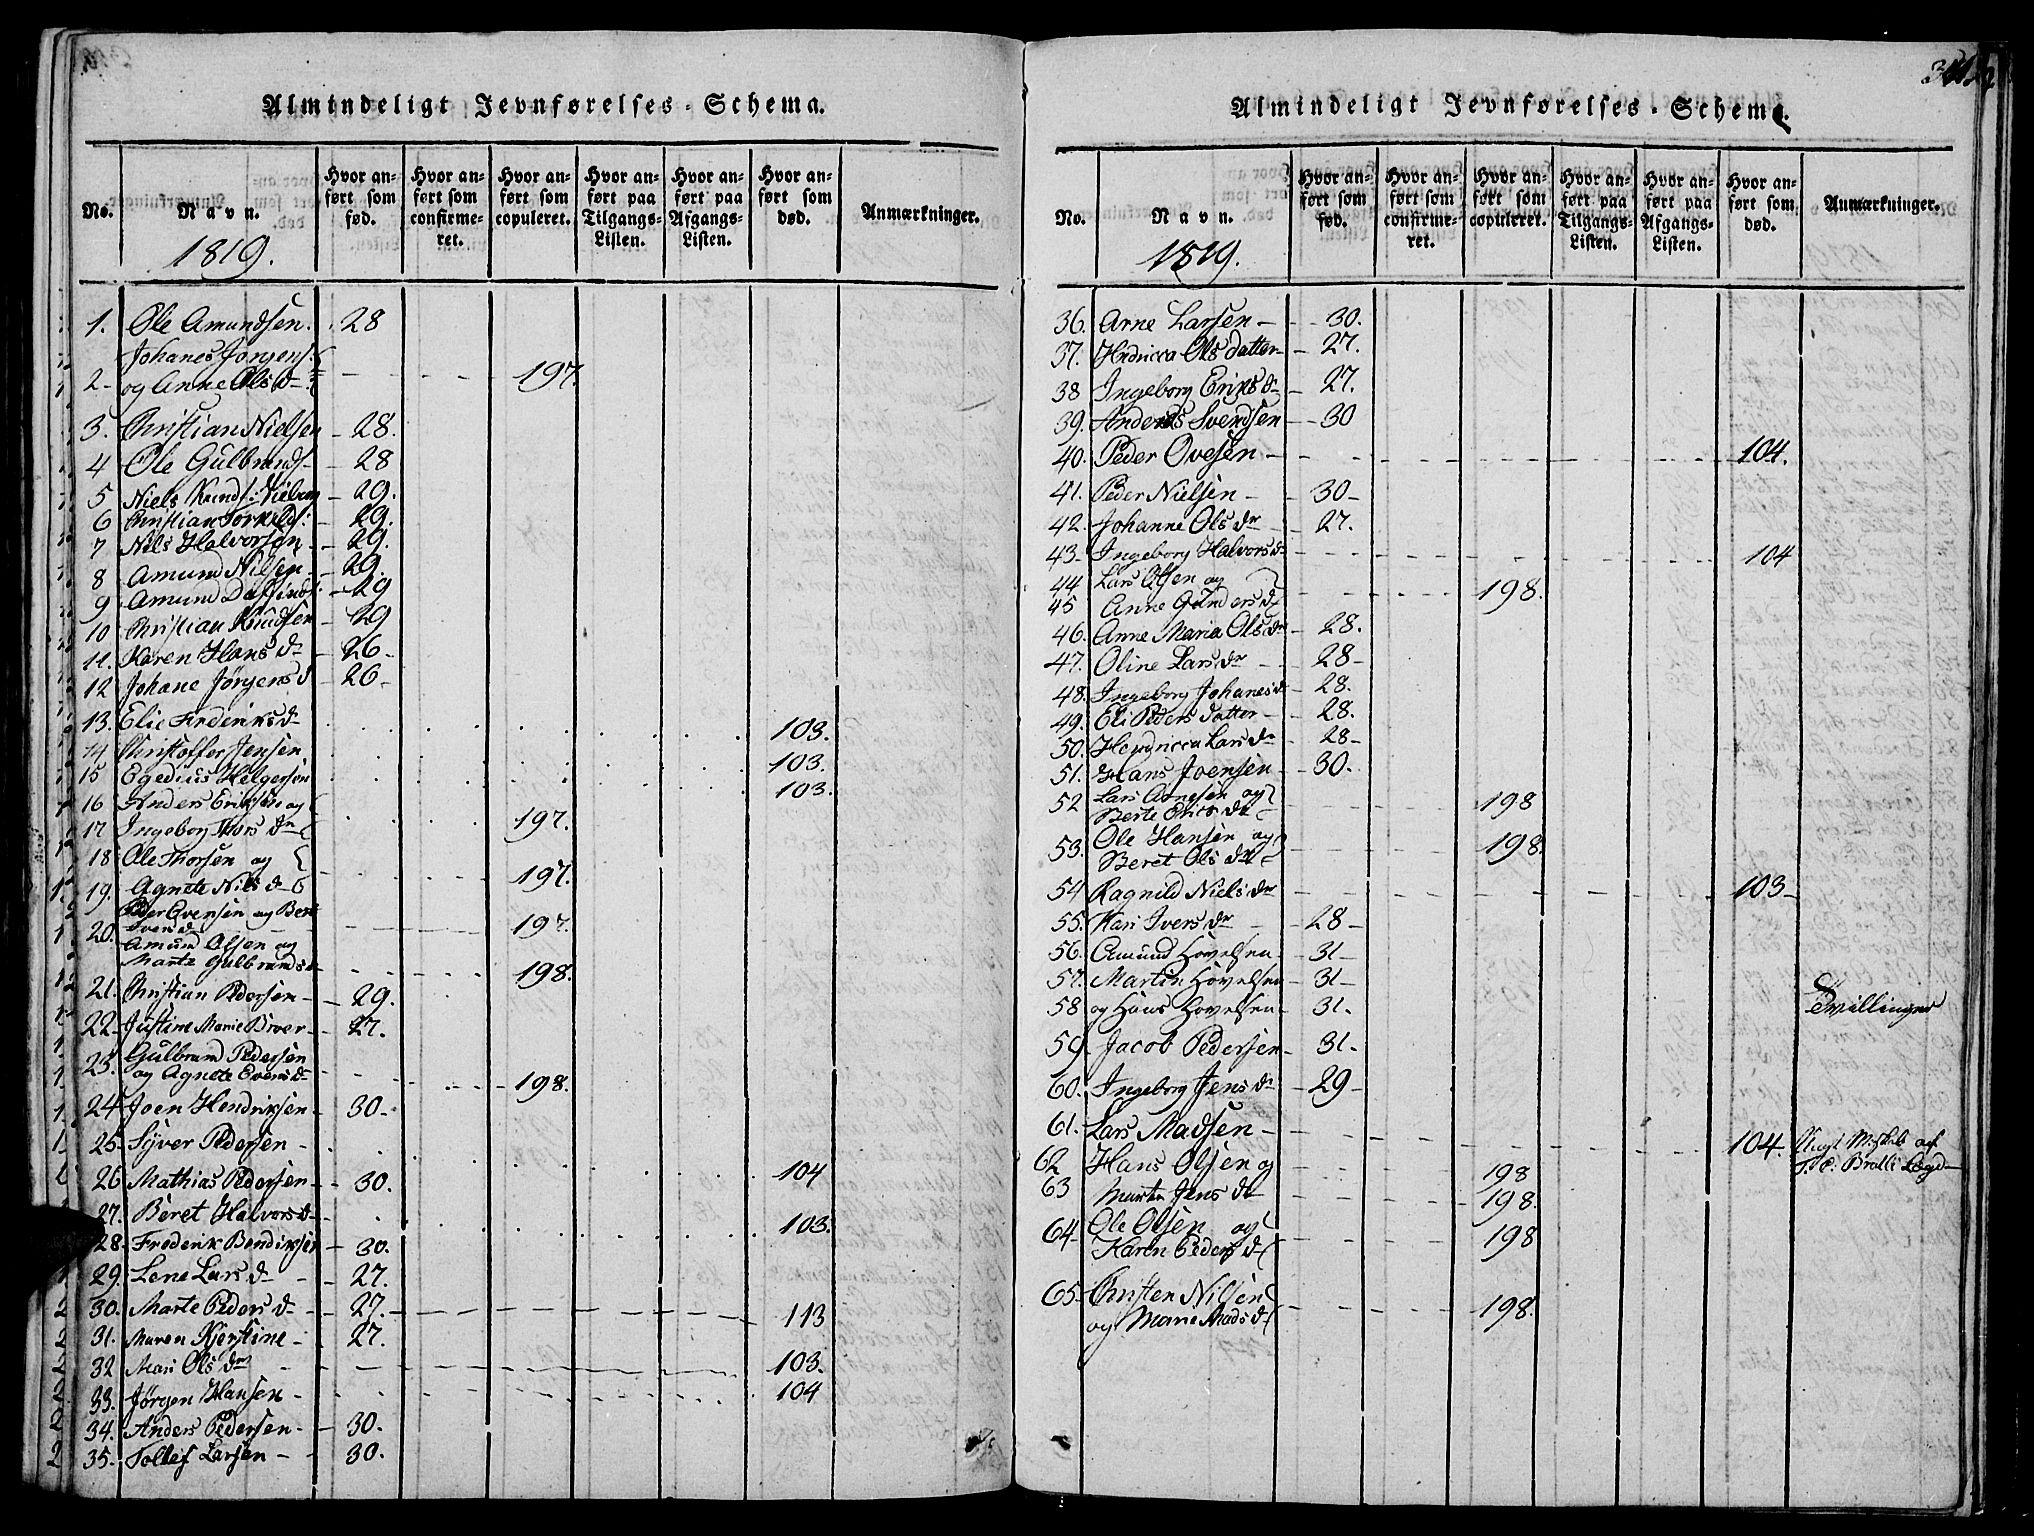 SAH, Biri prestekontor, Ministerialbok nr. 3, 1814-1828, s. 351